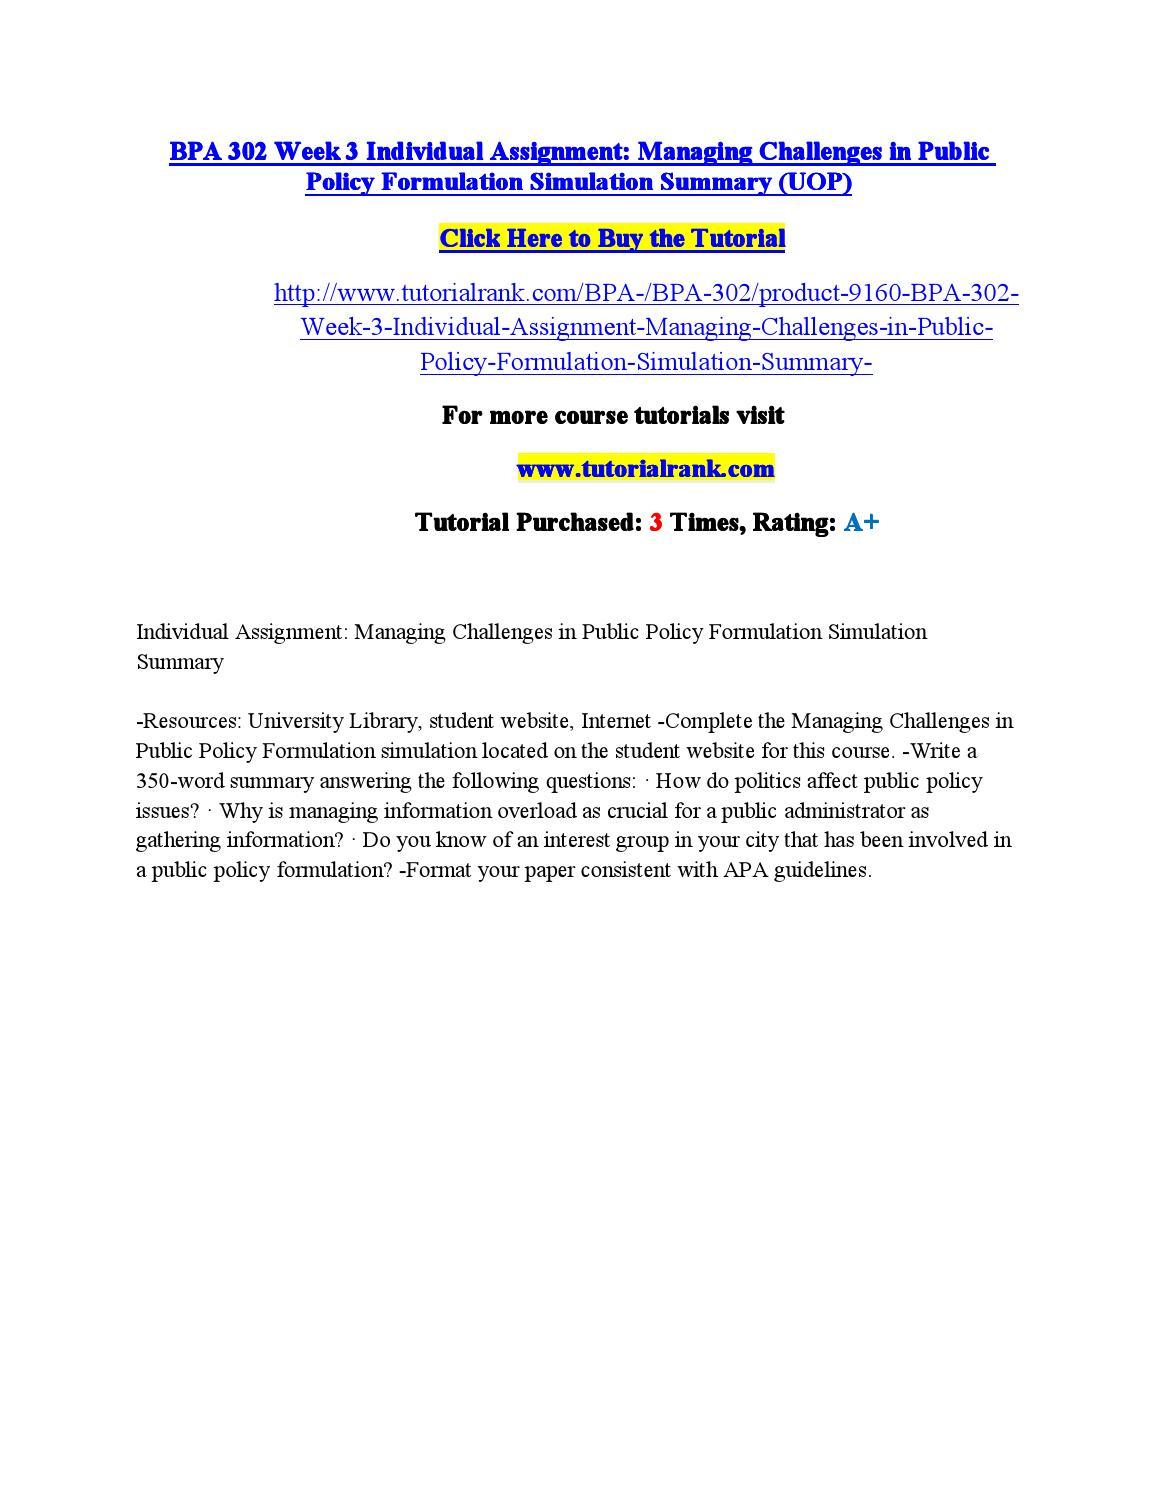 ccn2005 individual assignment guidelines 1 1 finanšu inženierija studiju programmas mērķis un uzdevumi programmas  mērķis ir nodrošināt  the strategy and tactics of pricing: a guide to profitable  decision making  and computer networks (ccn 2005), october 24-26, 2005  marina del ray, ca, usa,  the teaching assignment erasmus programme no.